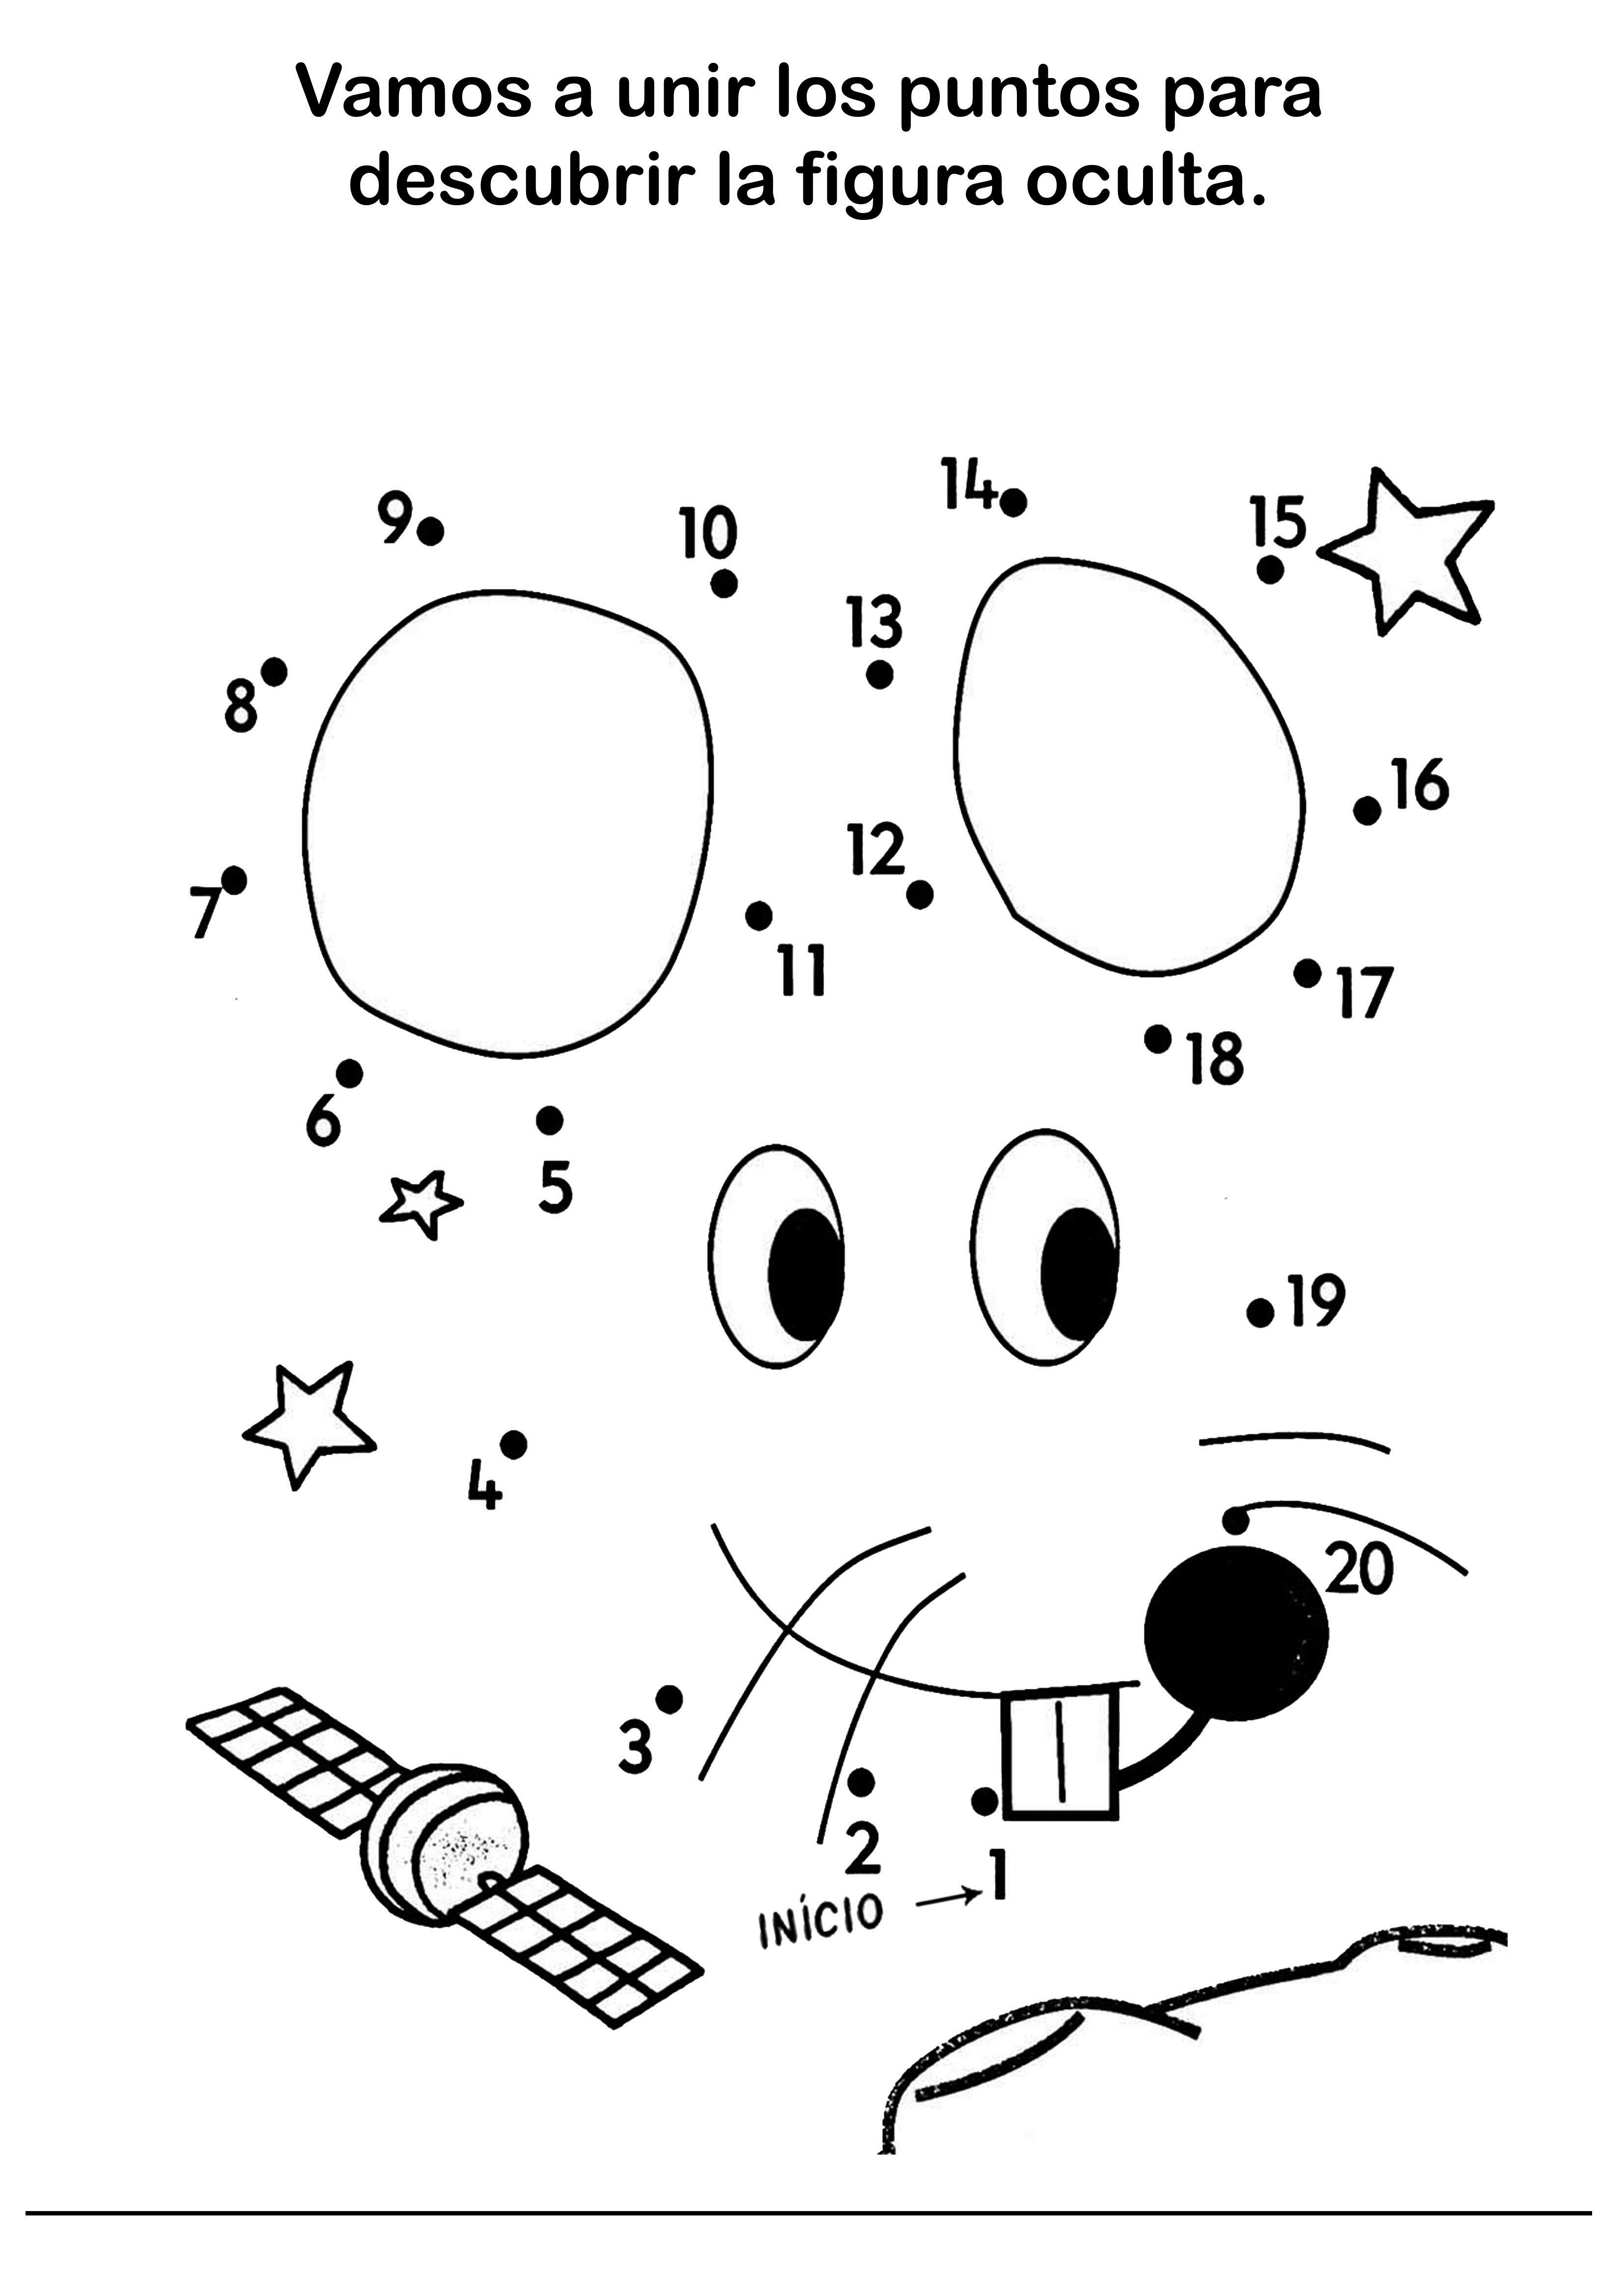 Fichas De Dibujos Unir Puntos Para Niños 23 Fichas Gratis Pdf